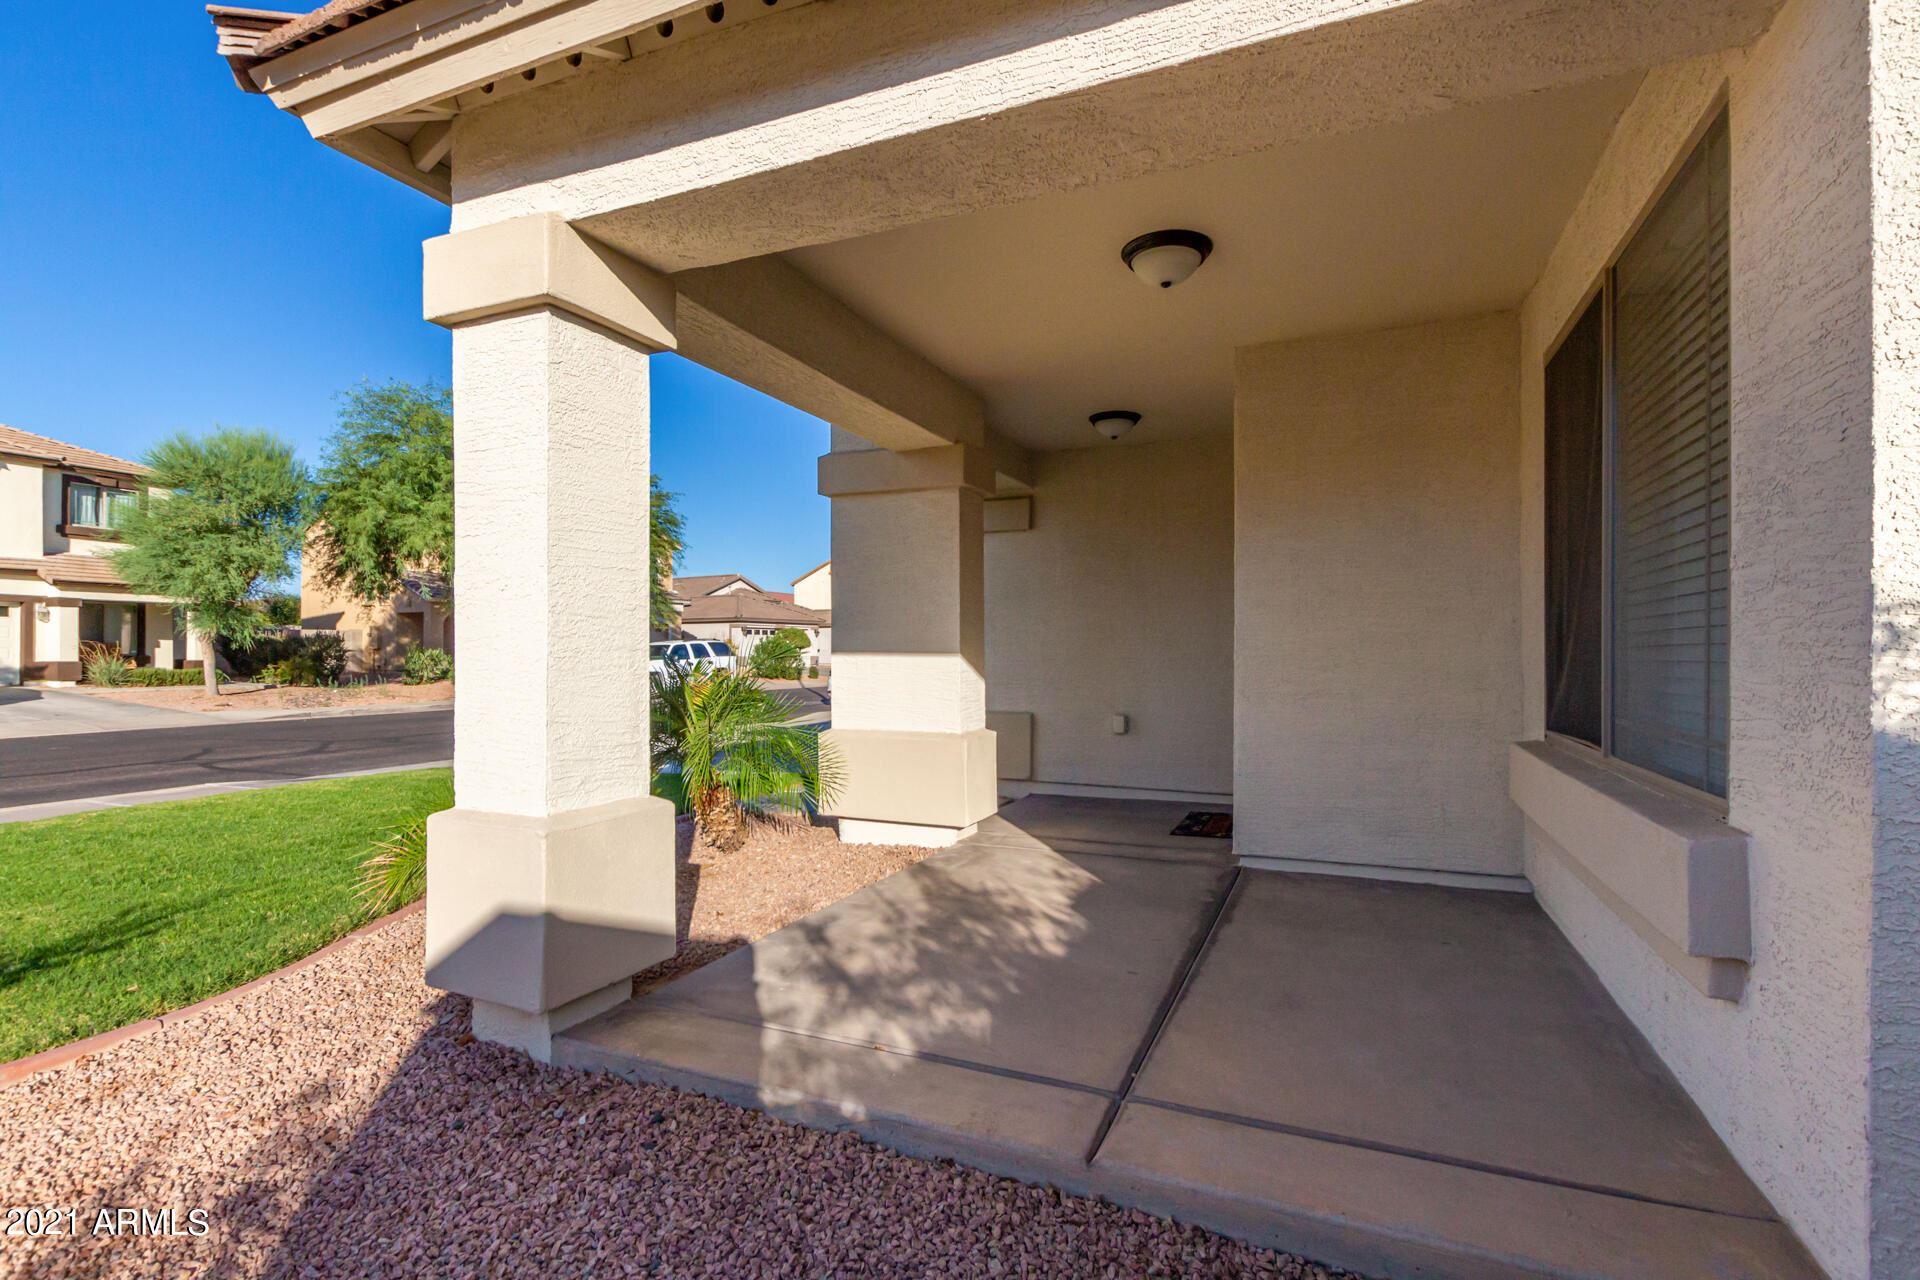 Photo of 11233 W LOCUST Lane, Avondale, AZ 85323 (MLS # 6307800)